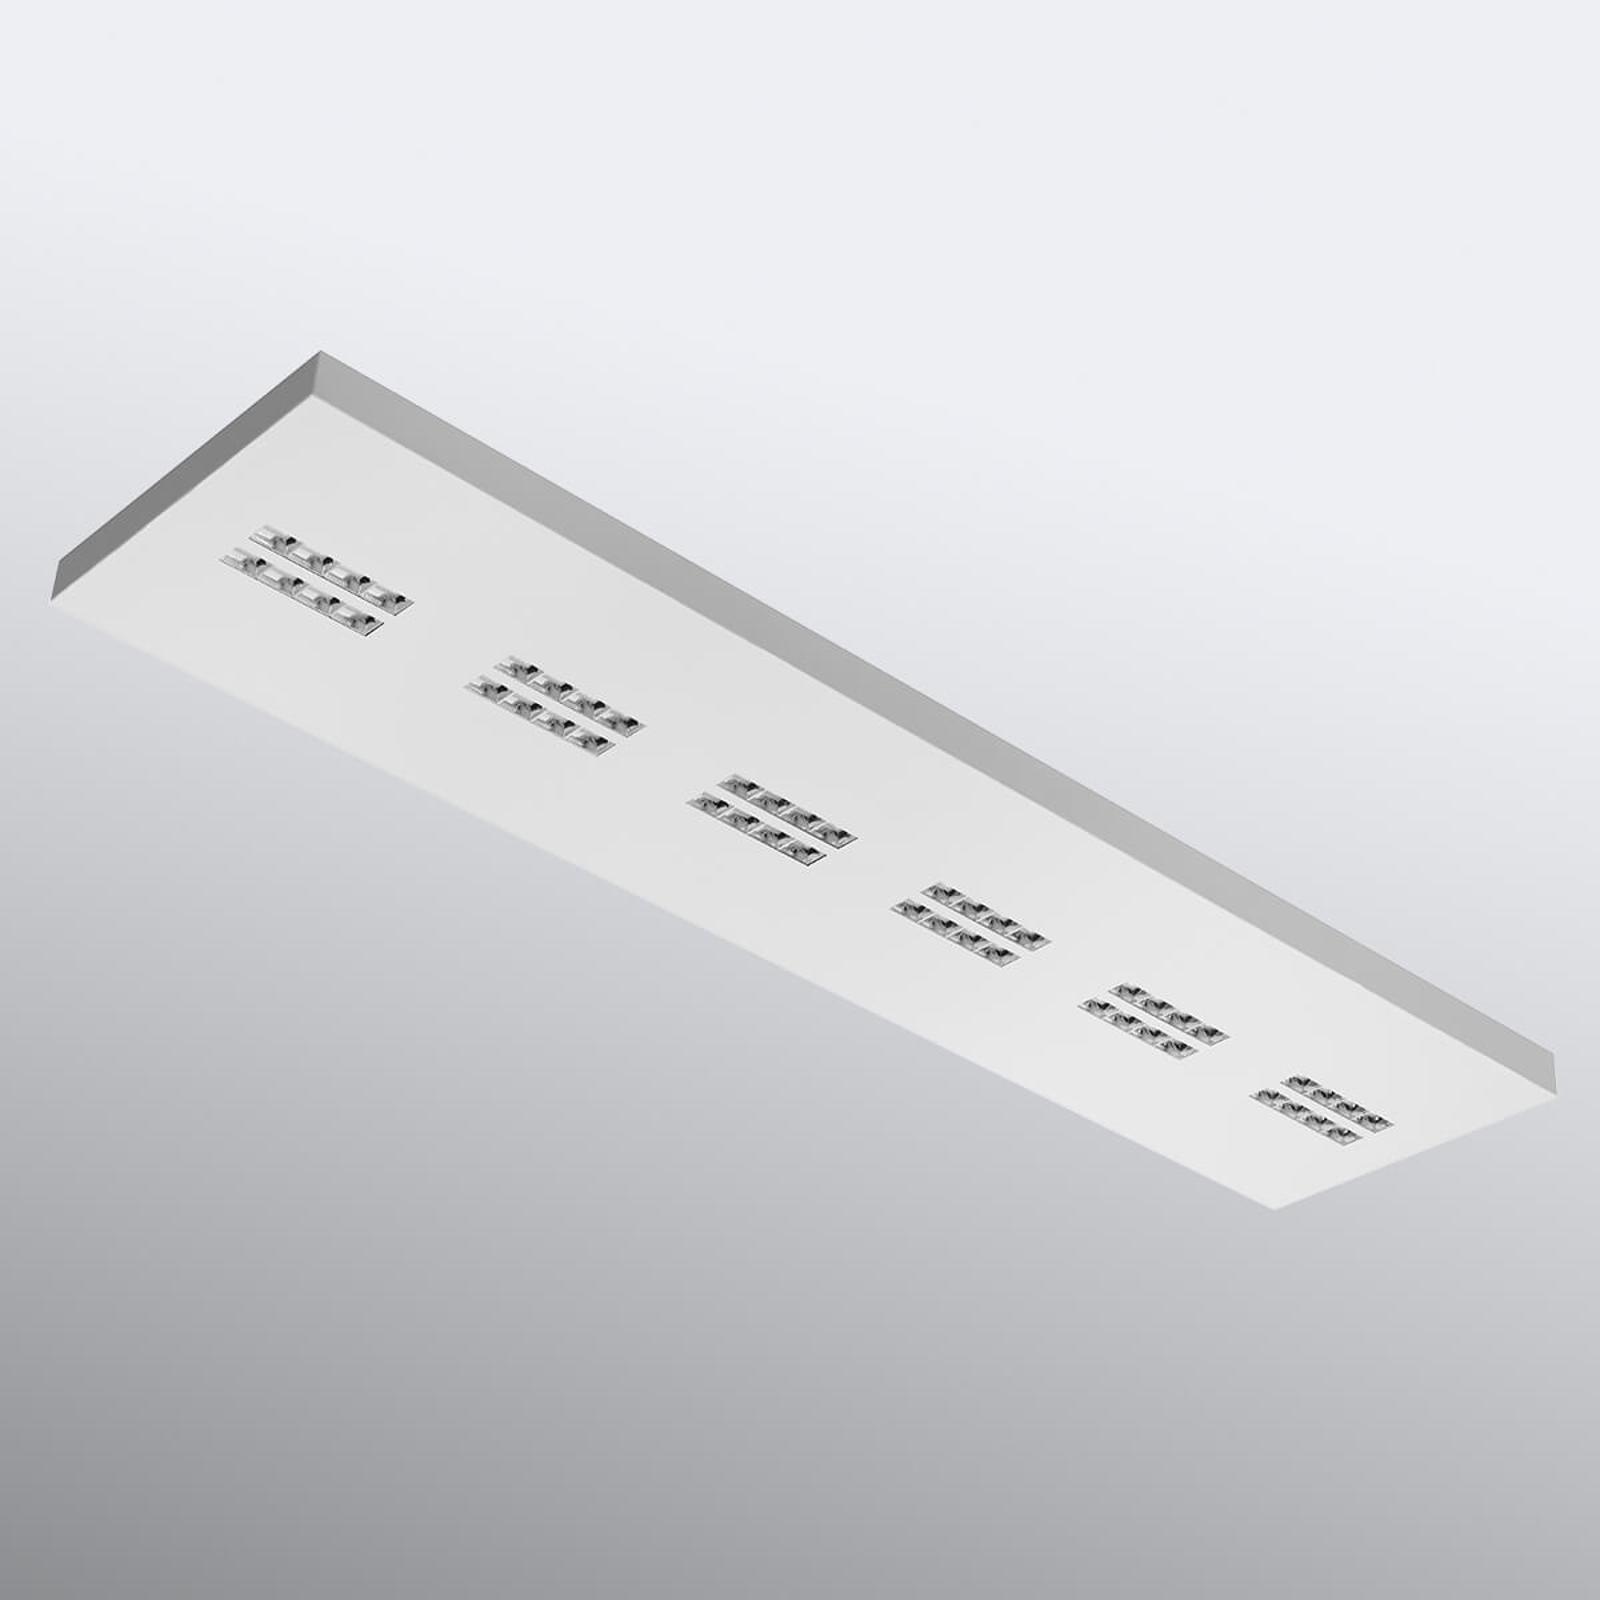 Prostokątna lampa sufitowa Declan II SS4, 4000K